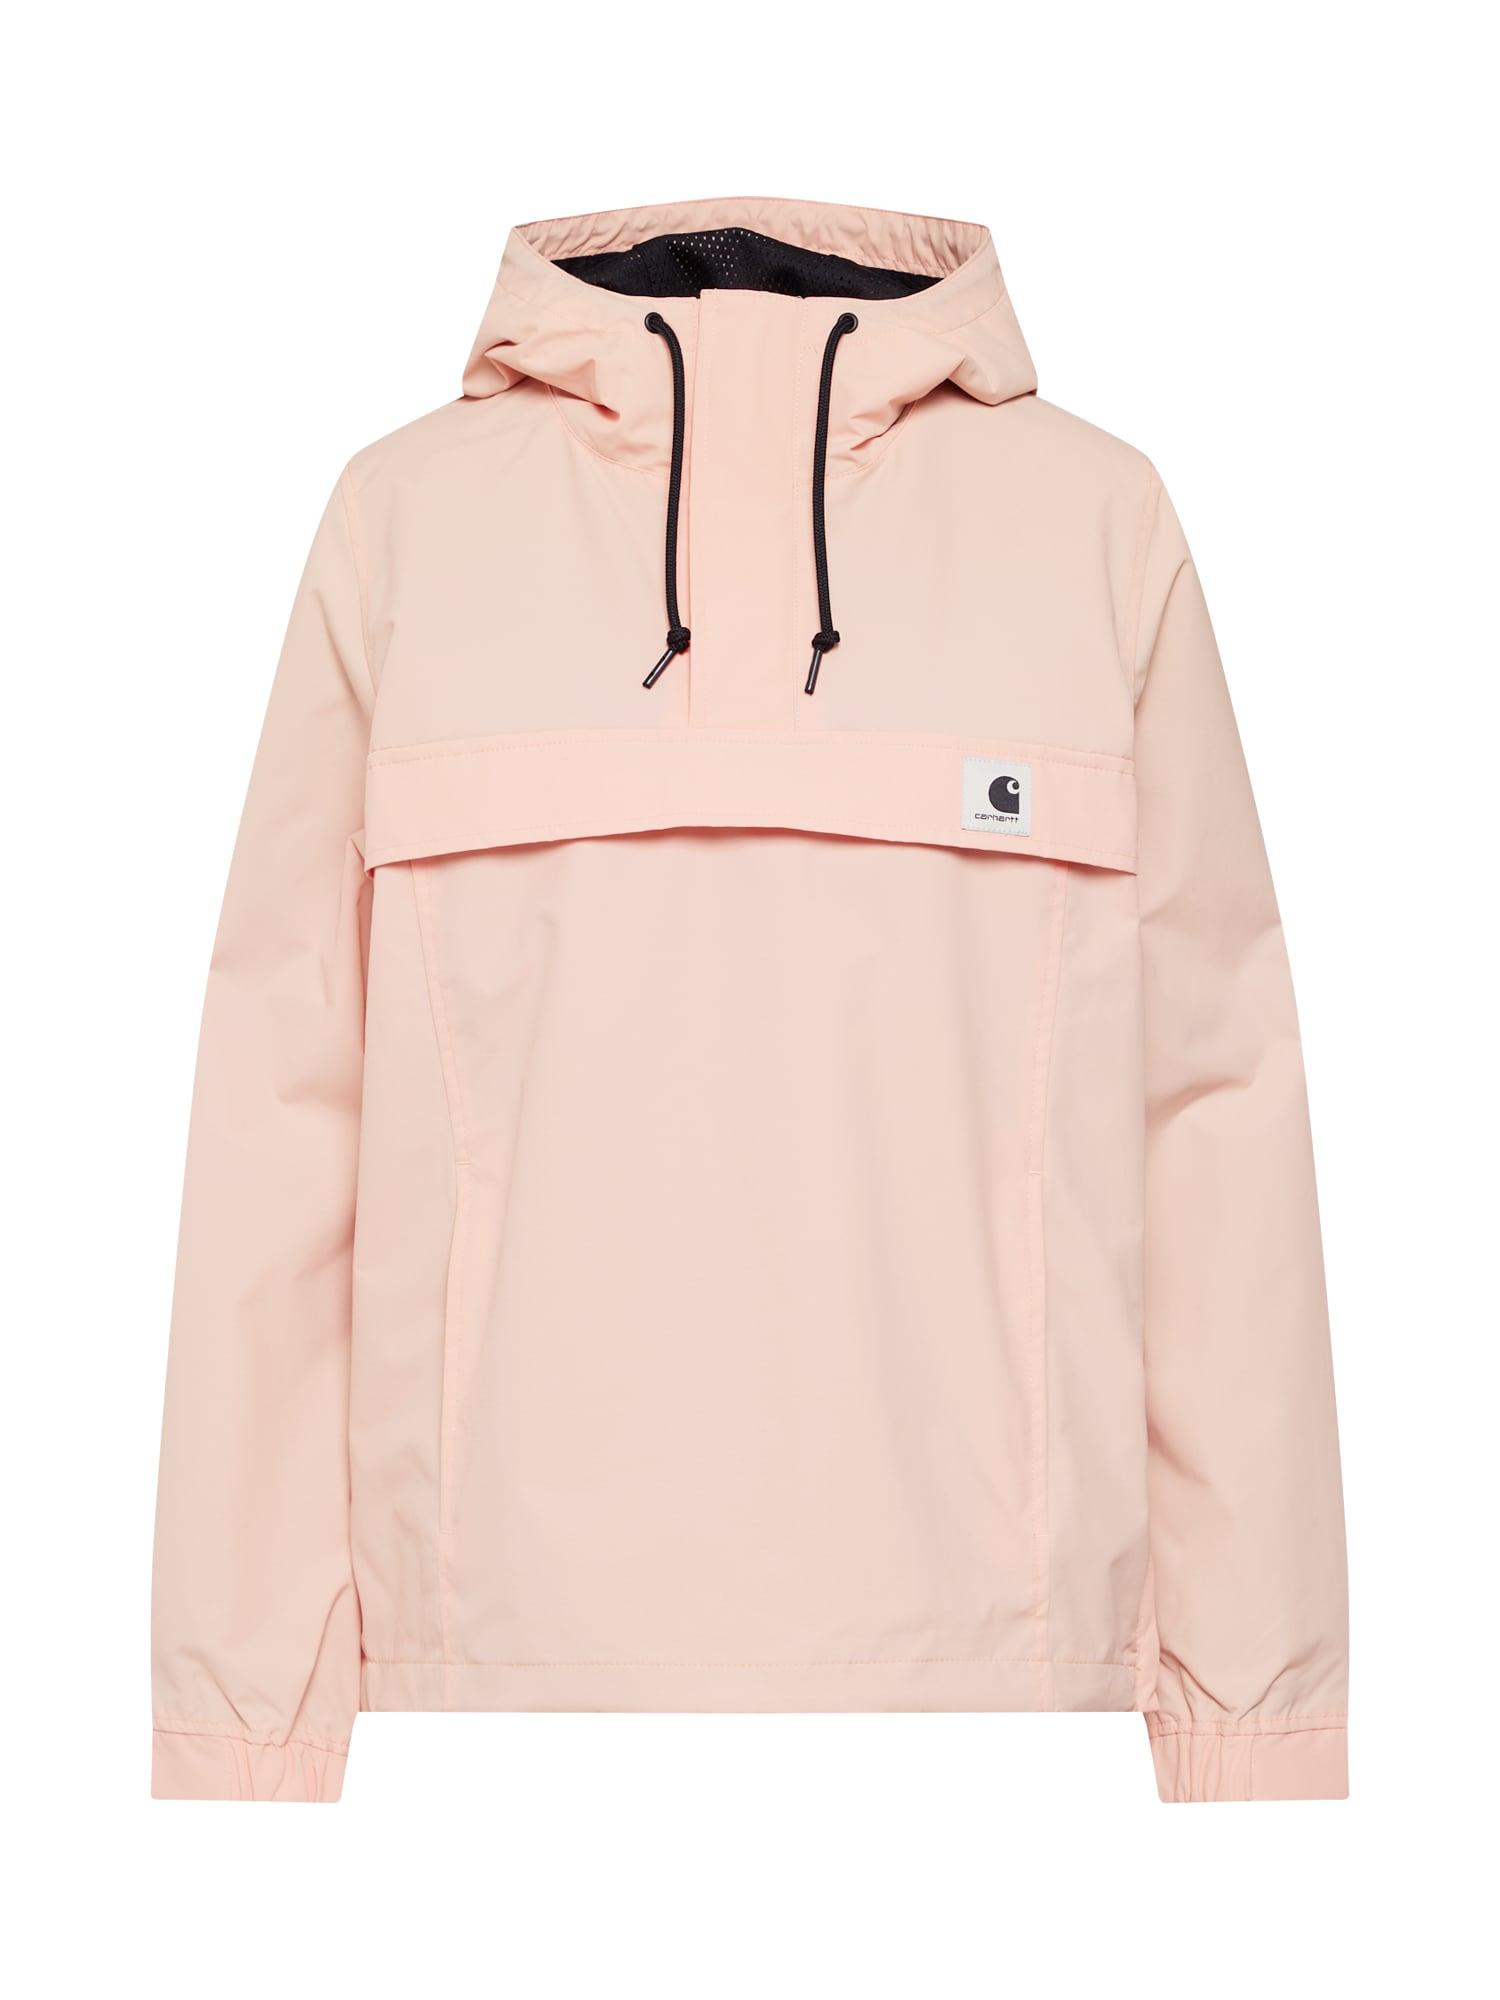 Přechodná bunda Jack Nimbus růžová Carhartt WIP